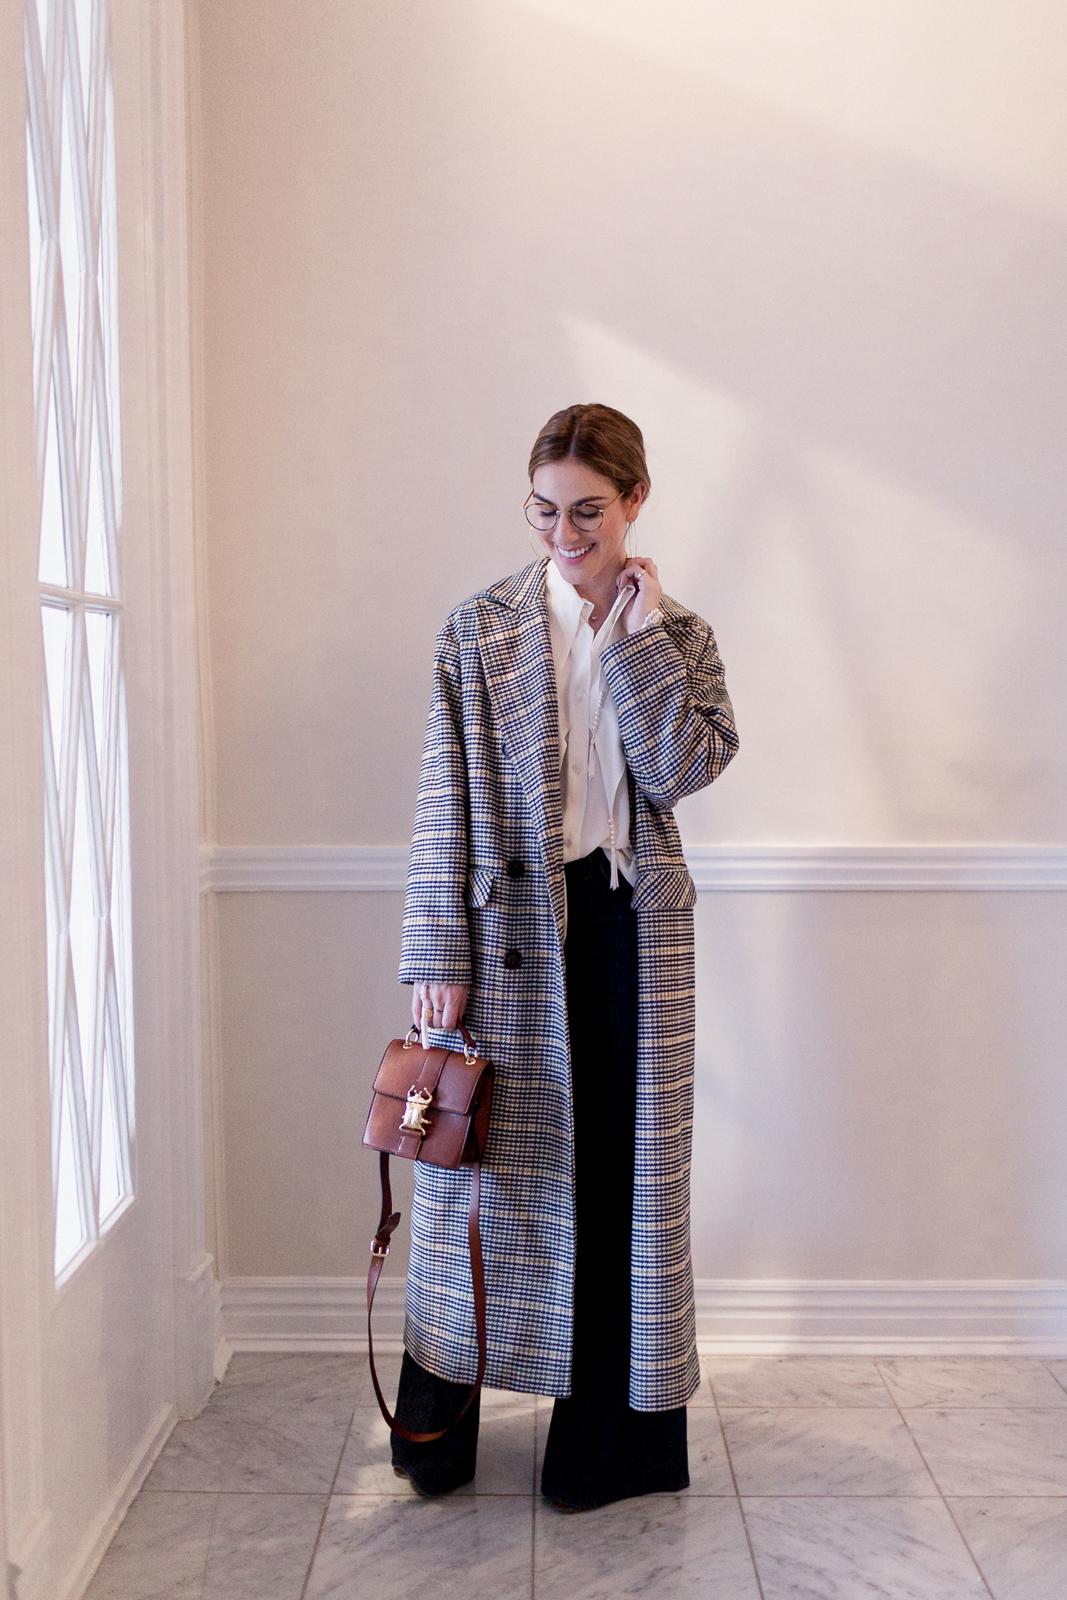 Eldridge Edit_anna_e_cottrell_fashion_blog_blogger_nordstrom_topshop_houndstooth_double_breasted_duster_coat_sale_topshop_garret_leight_glasses_thatch_lola_14k_gold_hoops_vintage_zara_bug_bag_mgb_photo_13.jpg